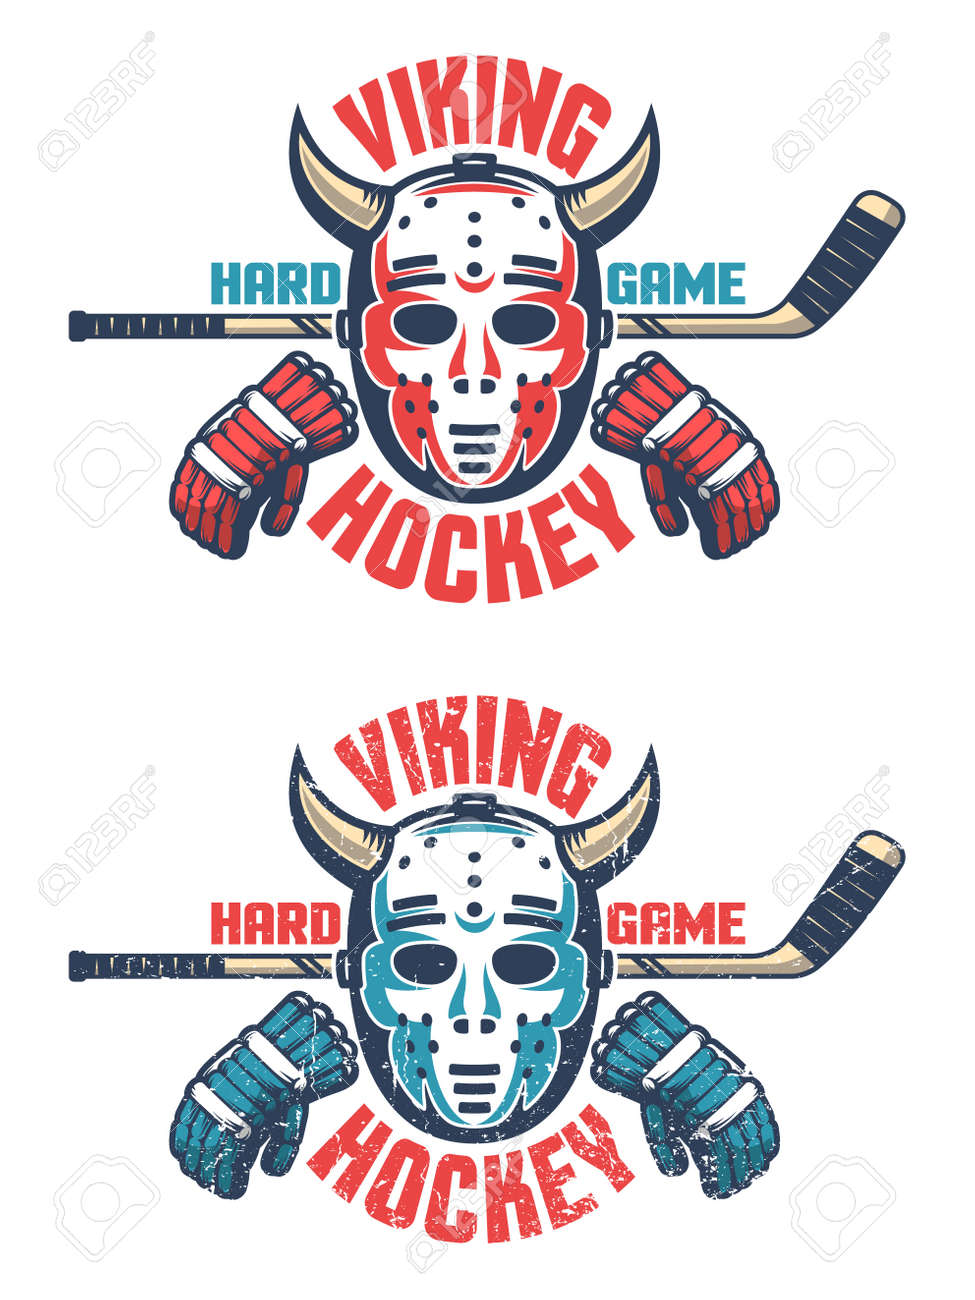 Oldschool Hockey Emblem Retro Goalie Mask With Horns Stick